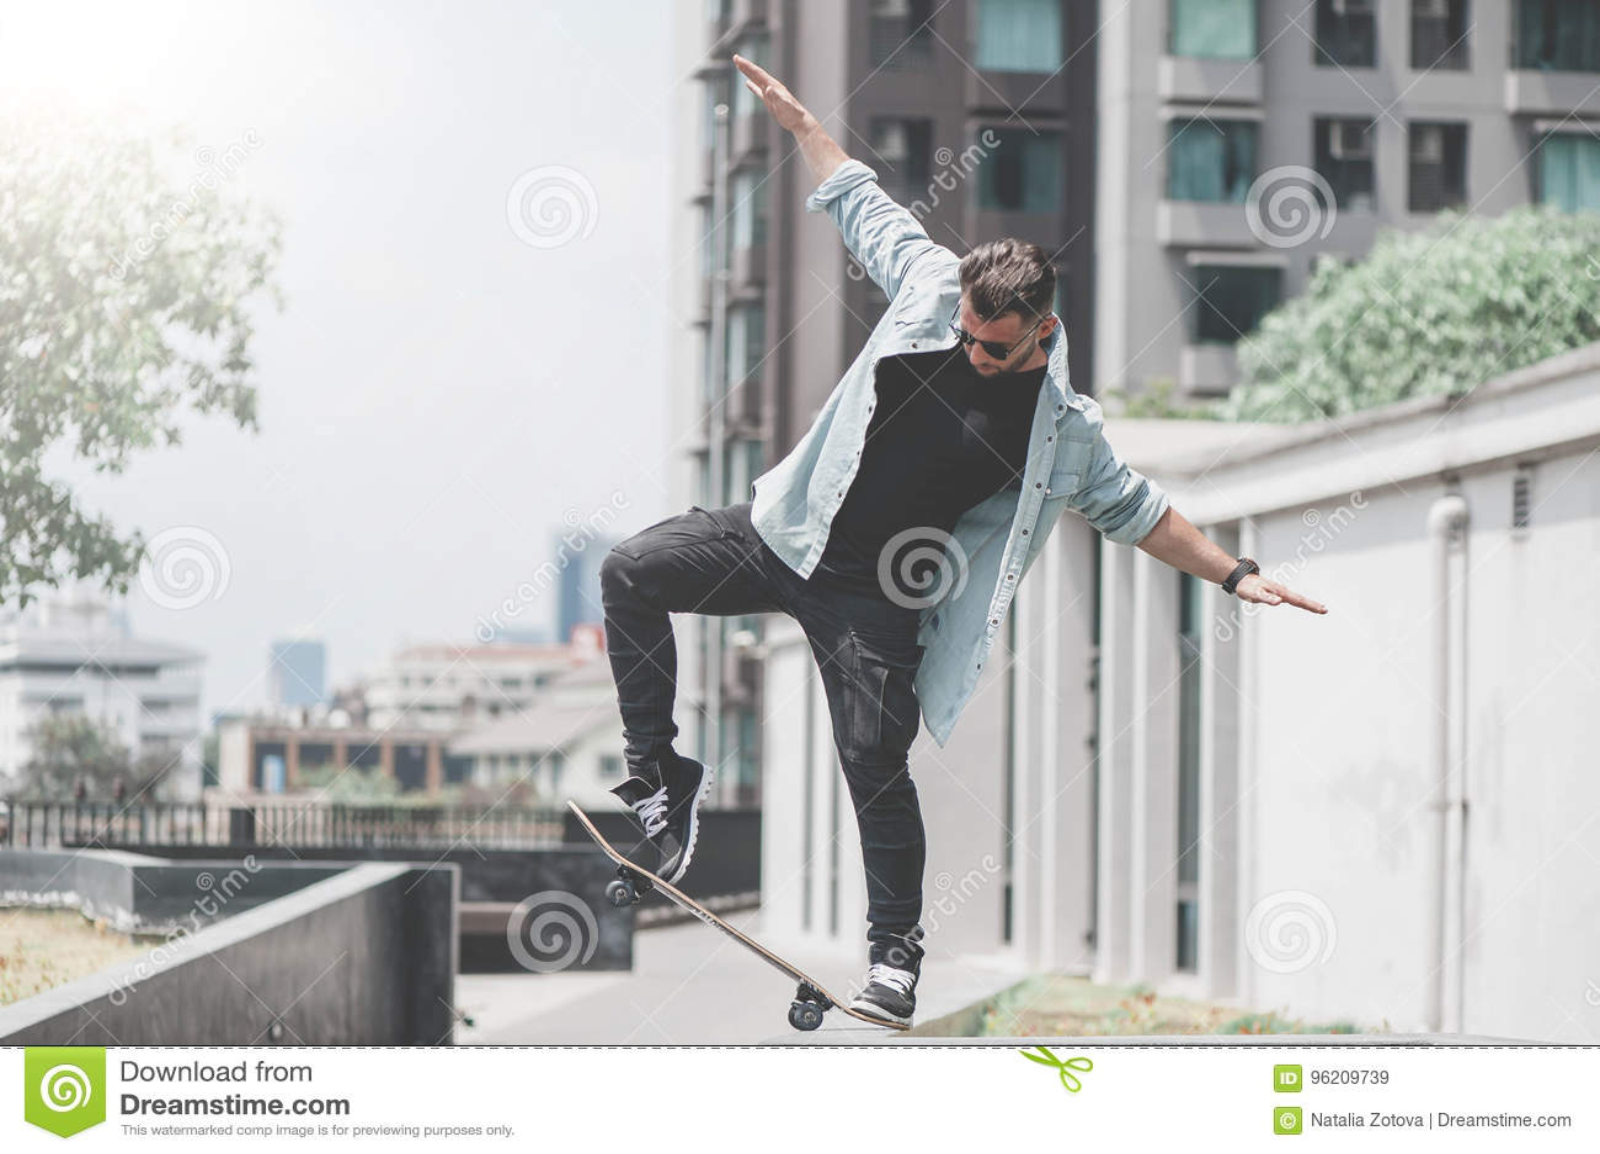 Boy skater is doing stunt at the street